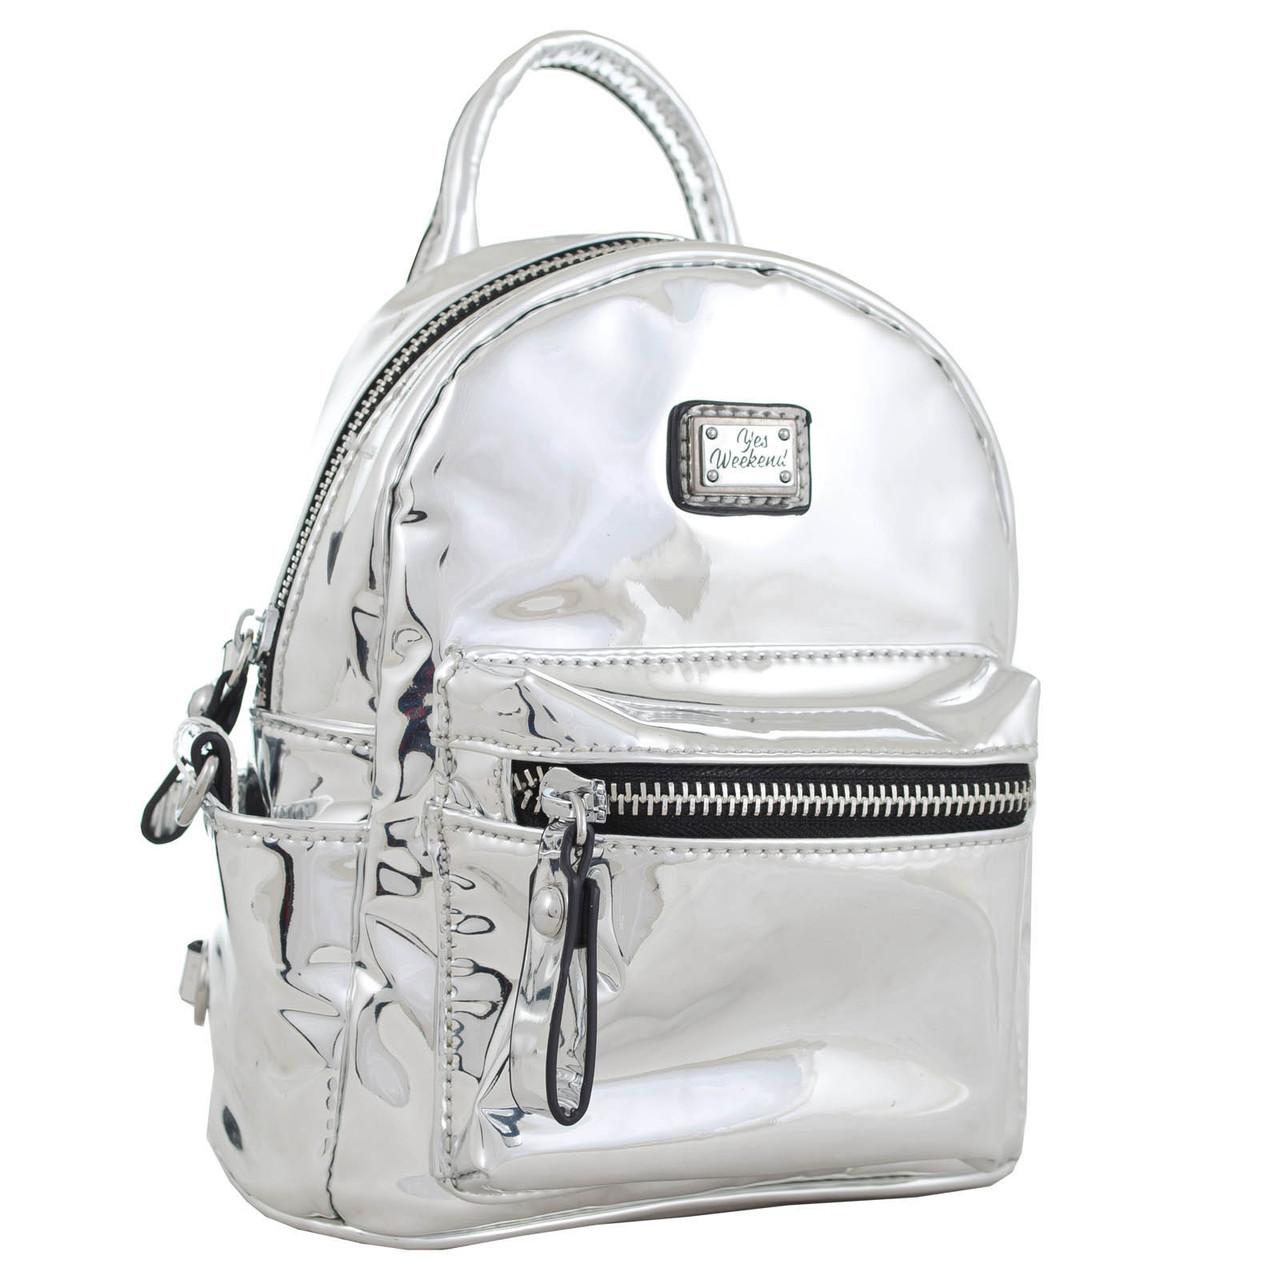 8fb337a31ac7 Женская сумка-рюкзак из экокожи, 1 ВЕРЕСНЯ Mirorr silver 3 л ...